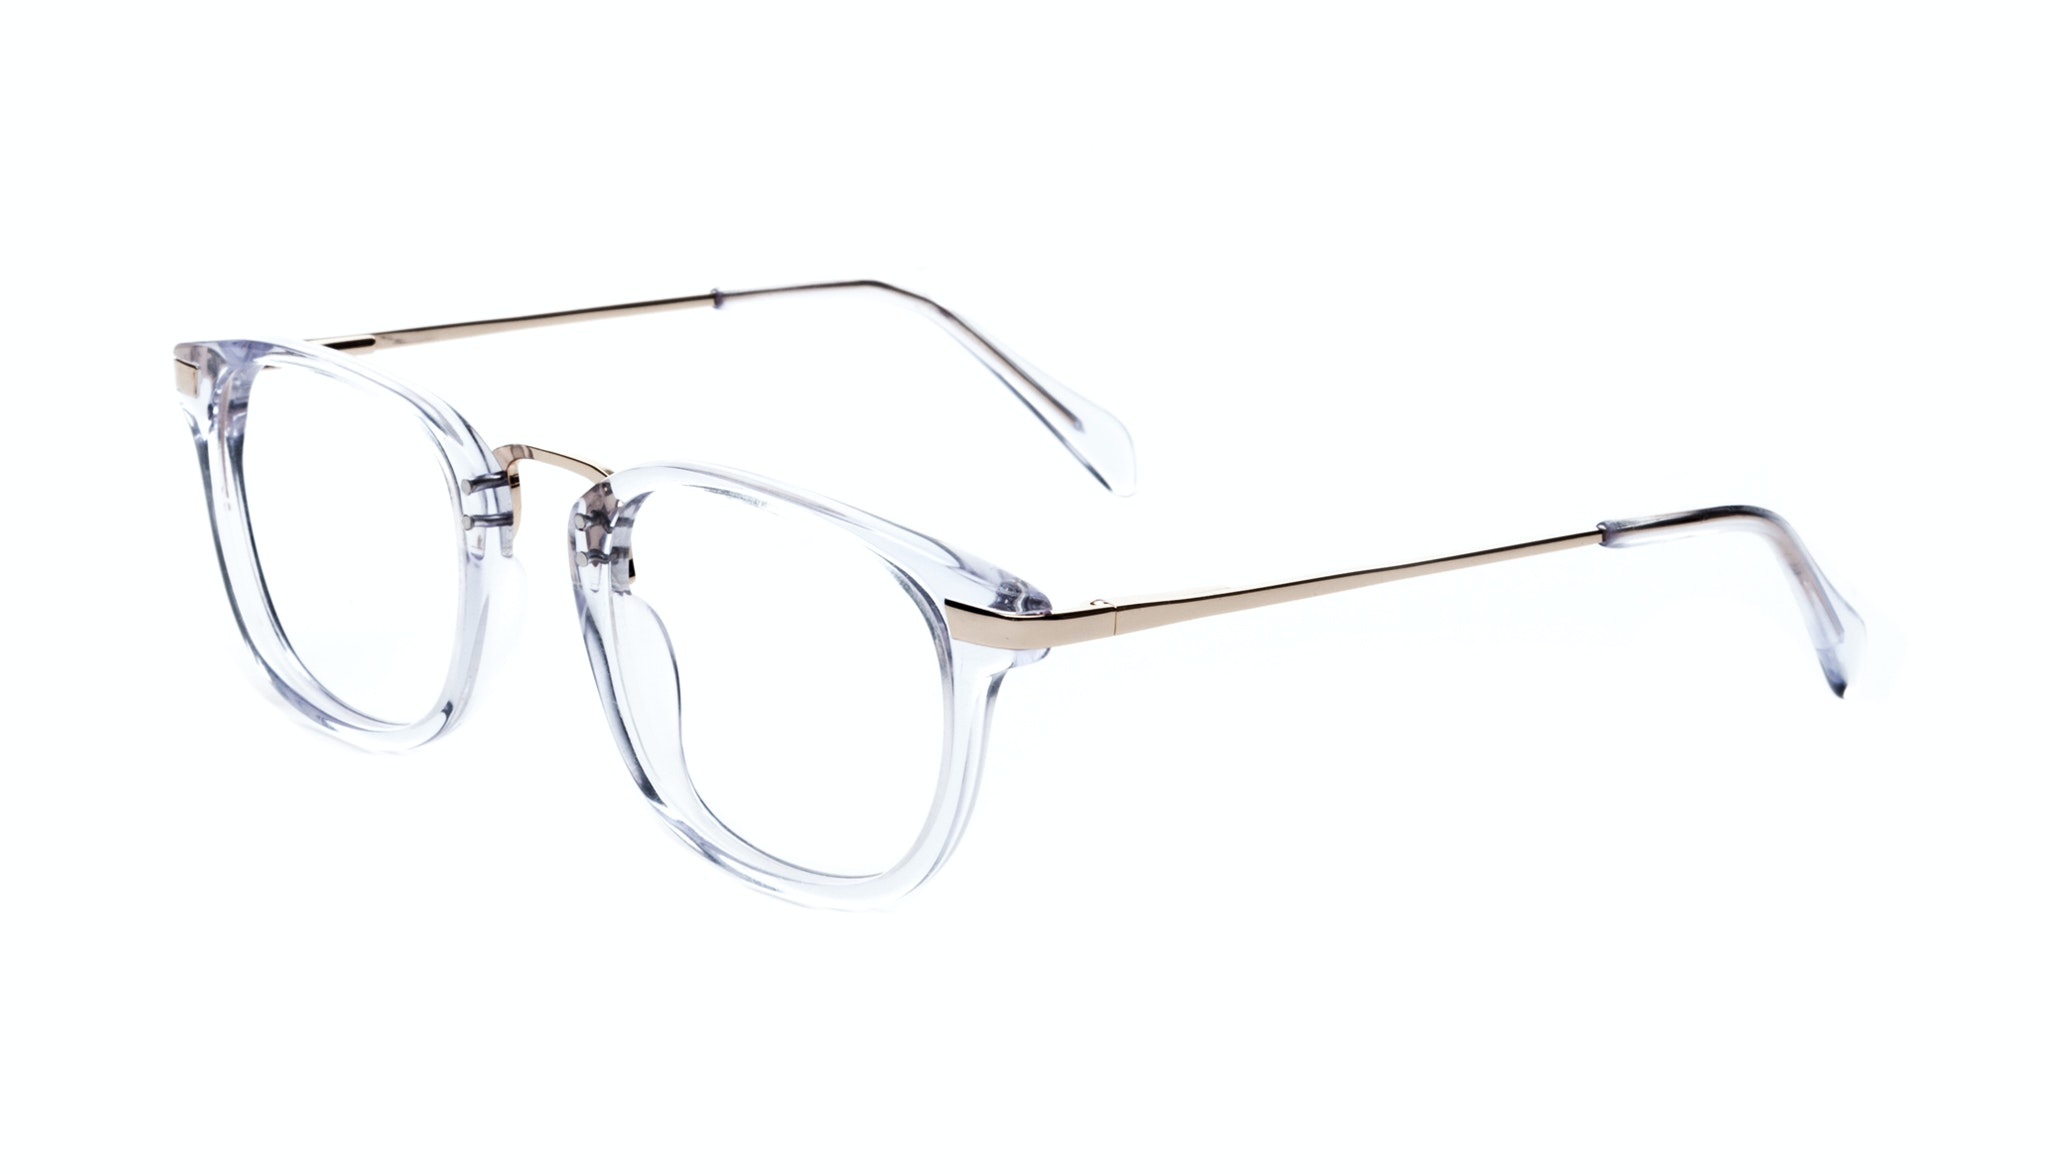 Affordable Fashion Glasses Rectangle Square Eyeglasses Men Daze Gold Diamond Tilt